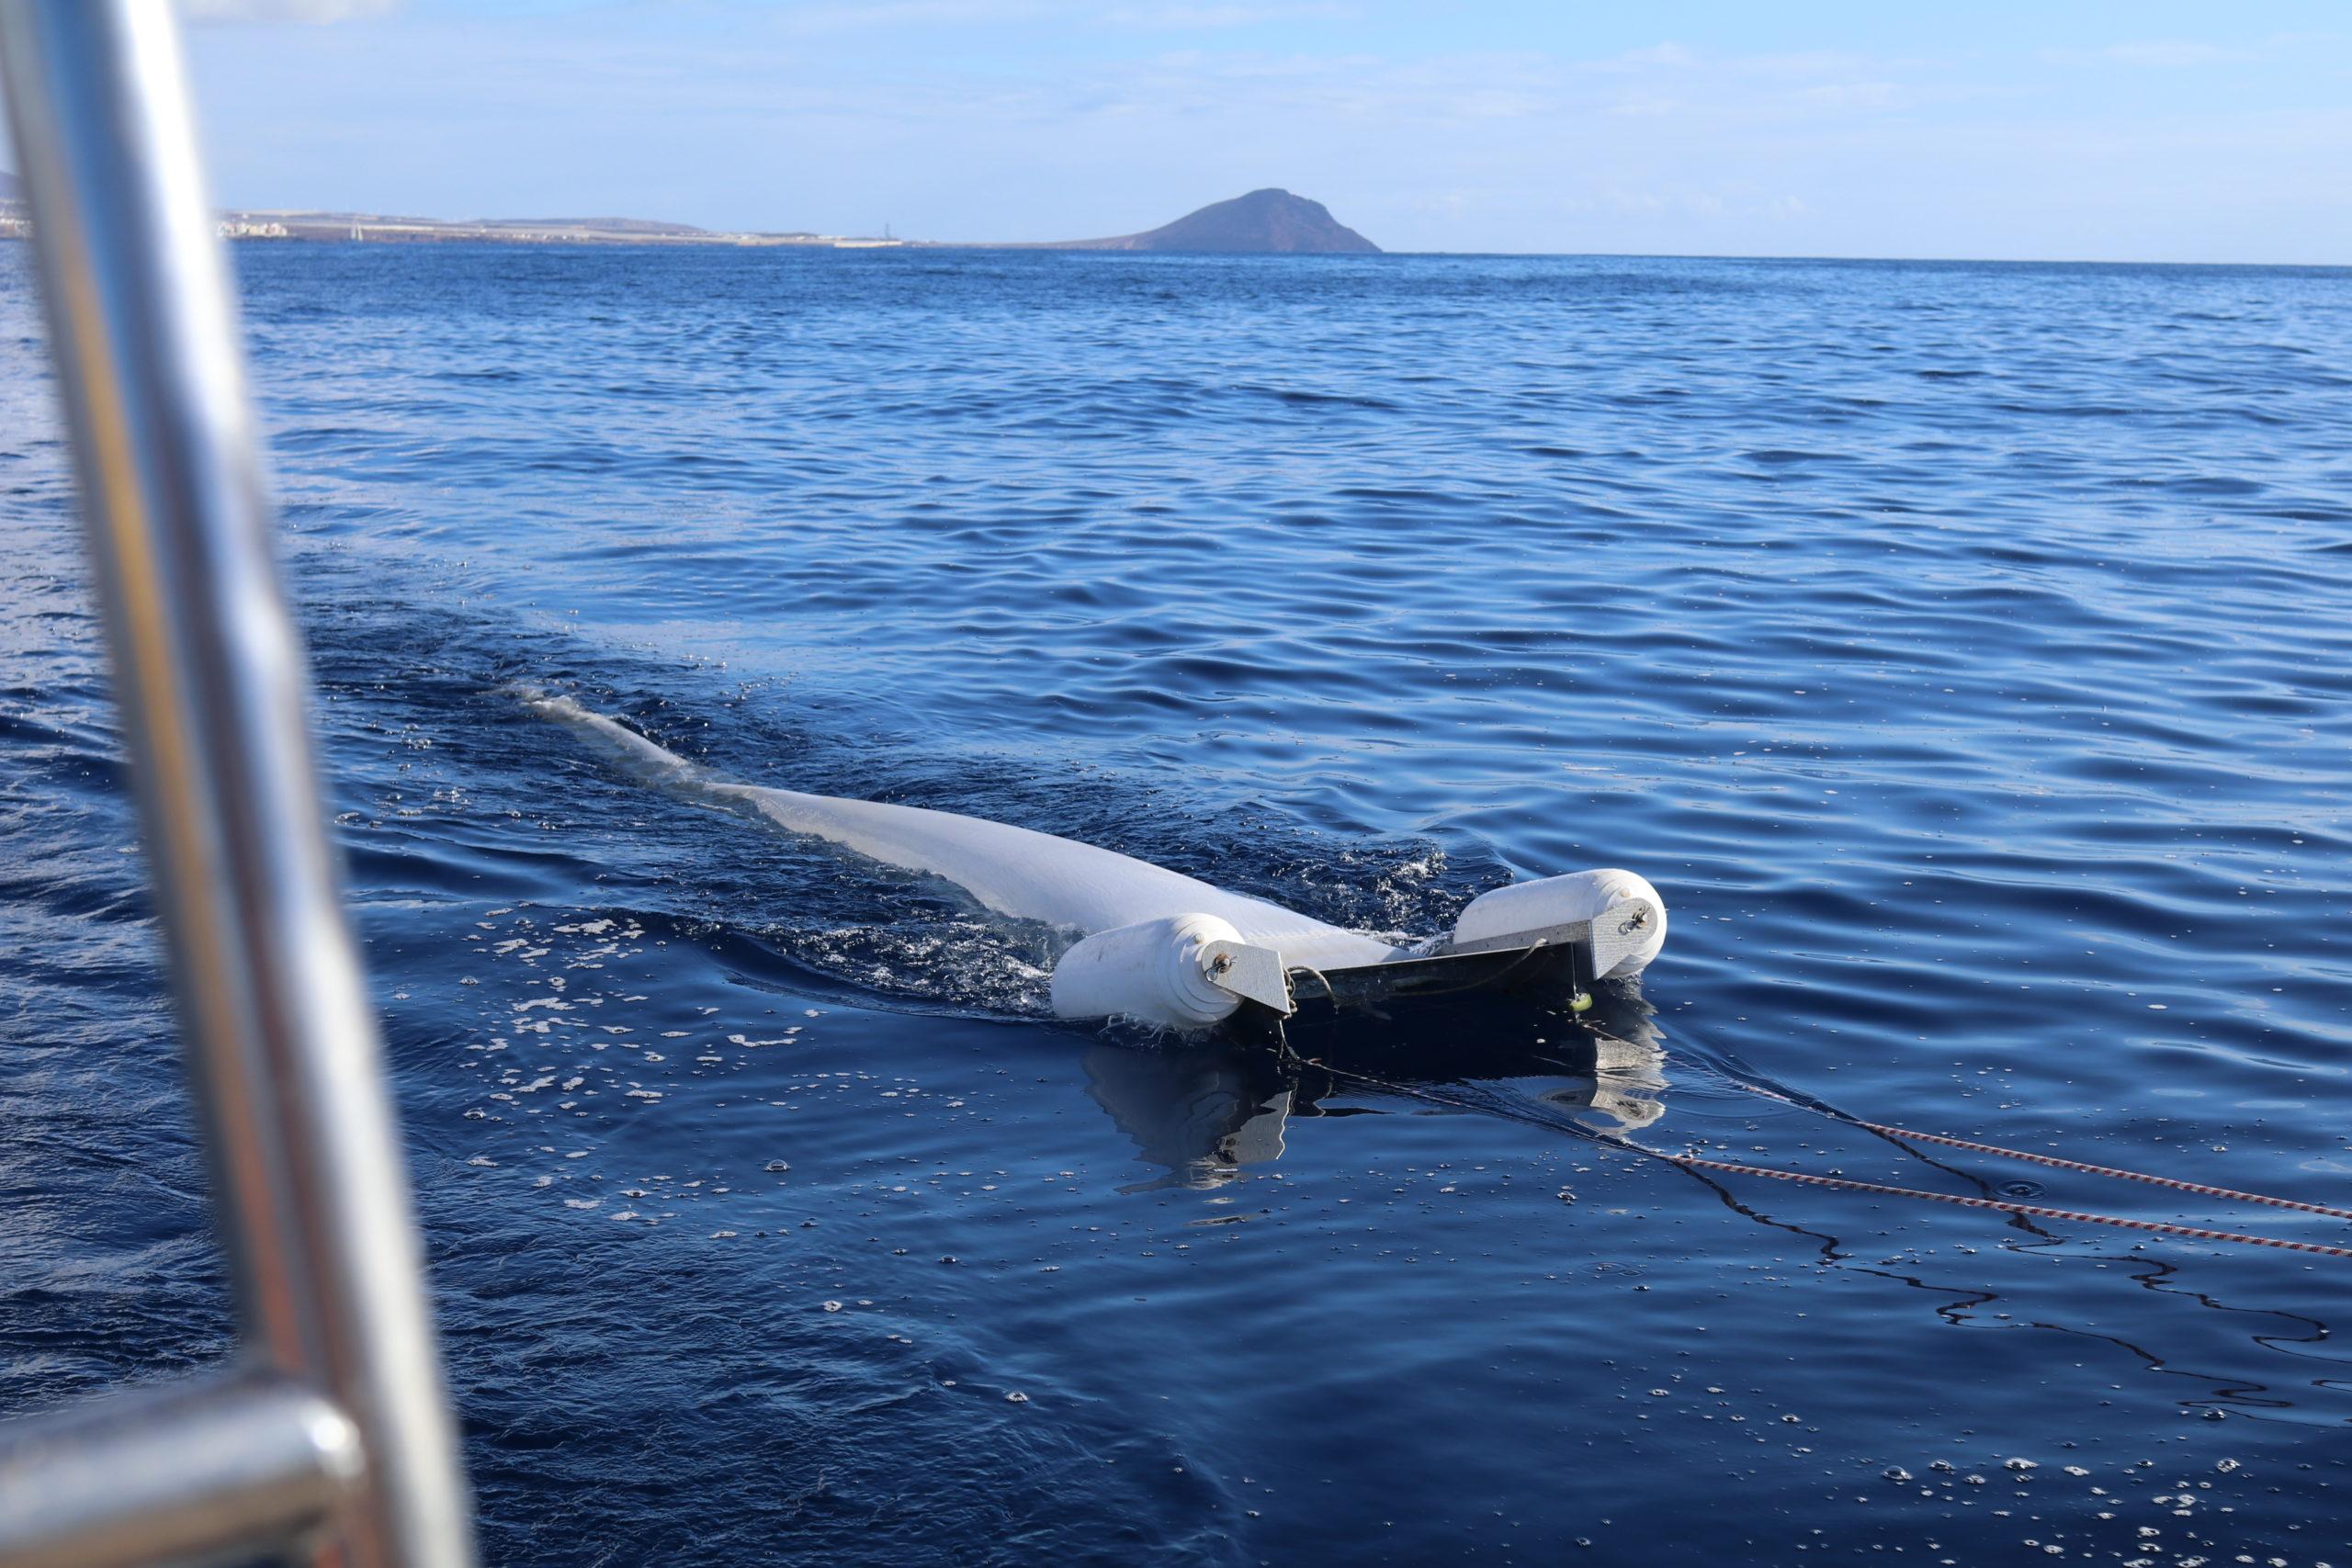 manta trawl seatheplastic